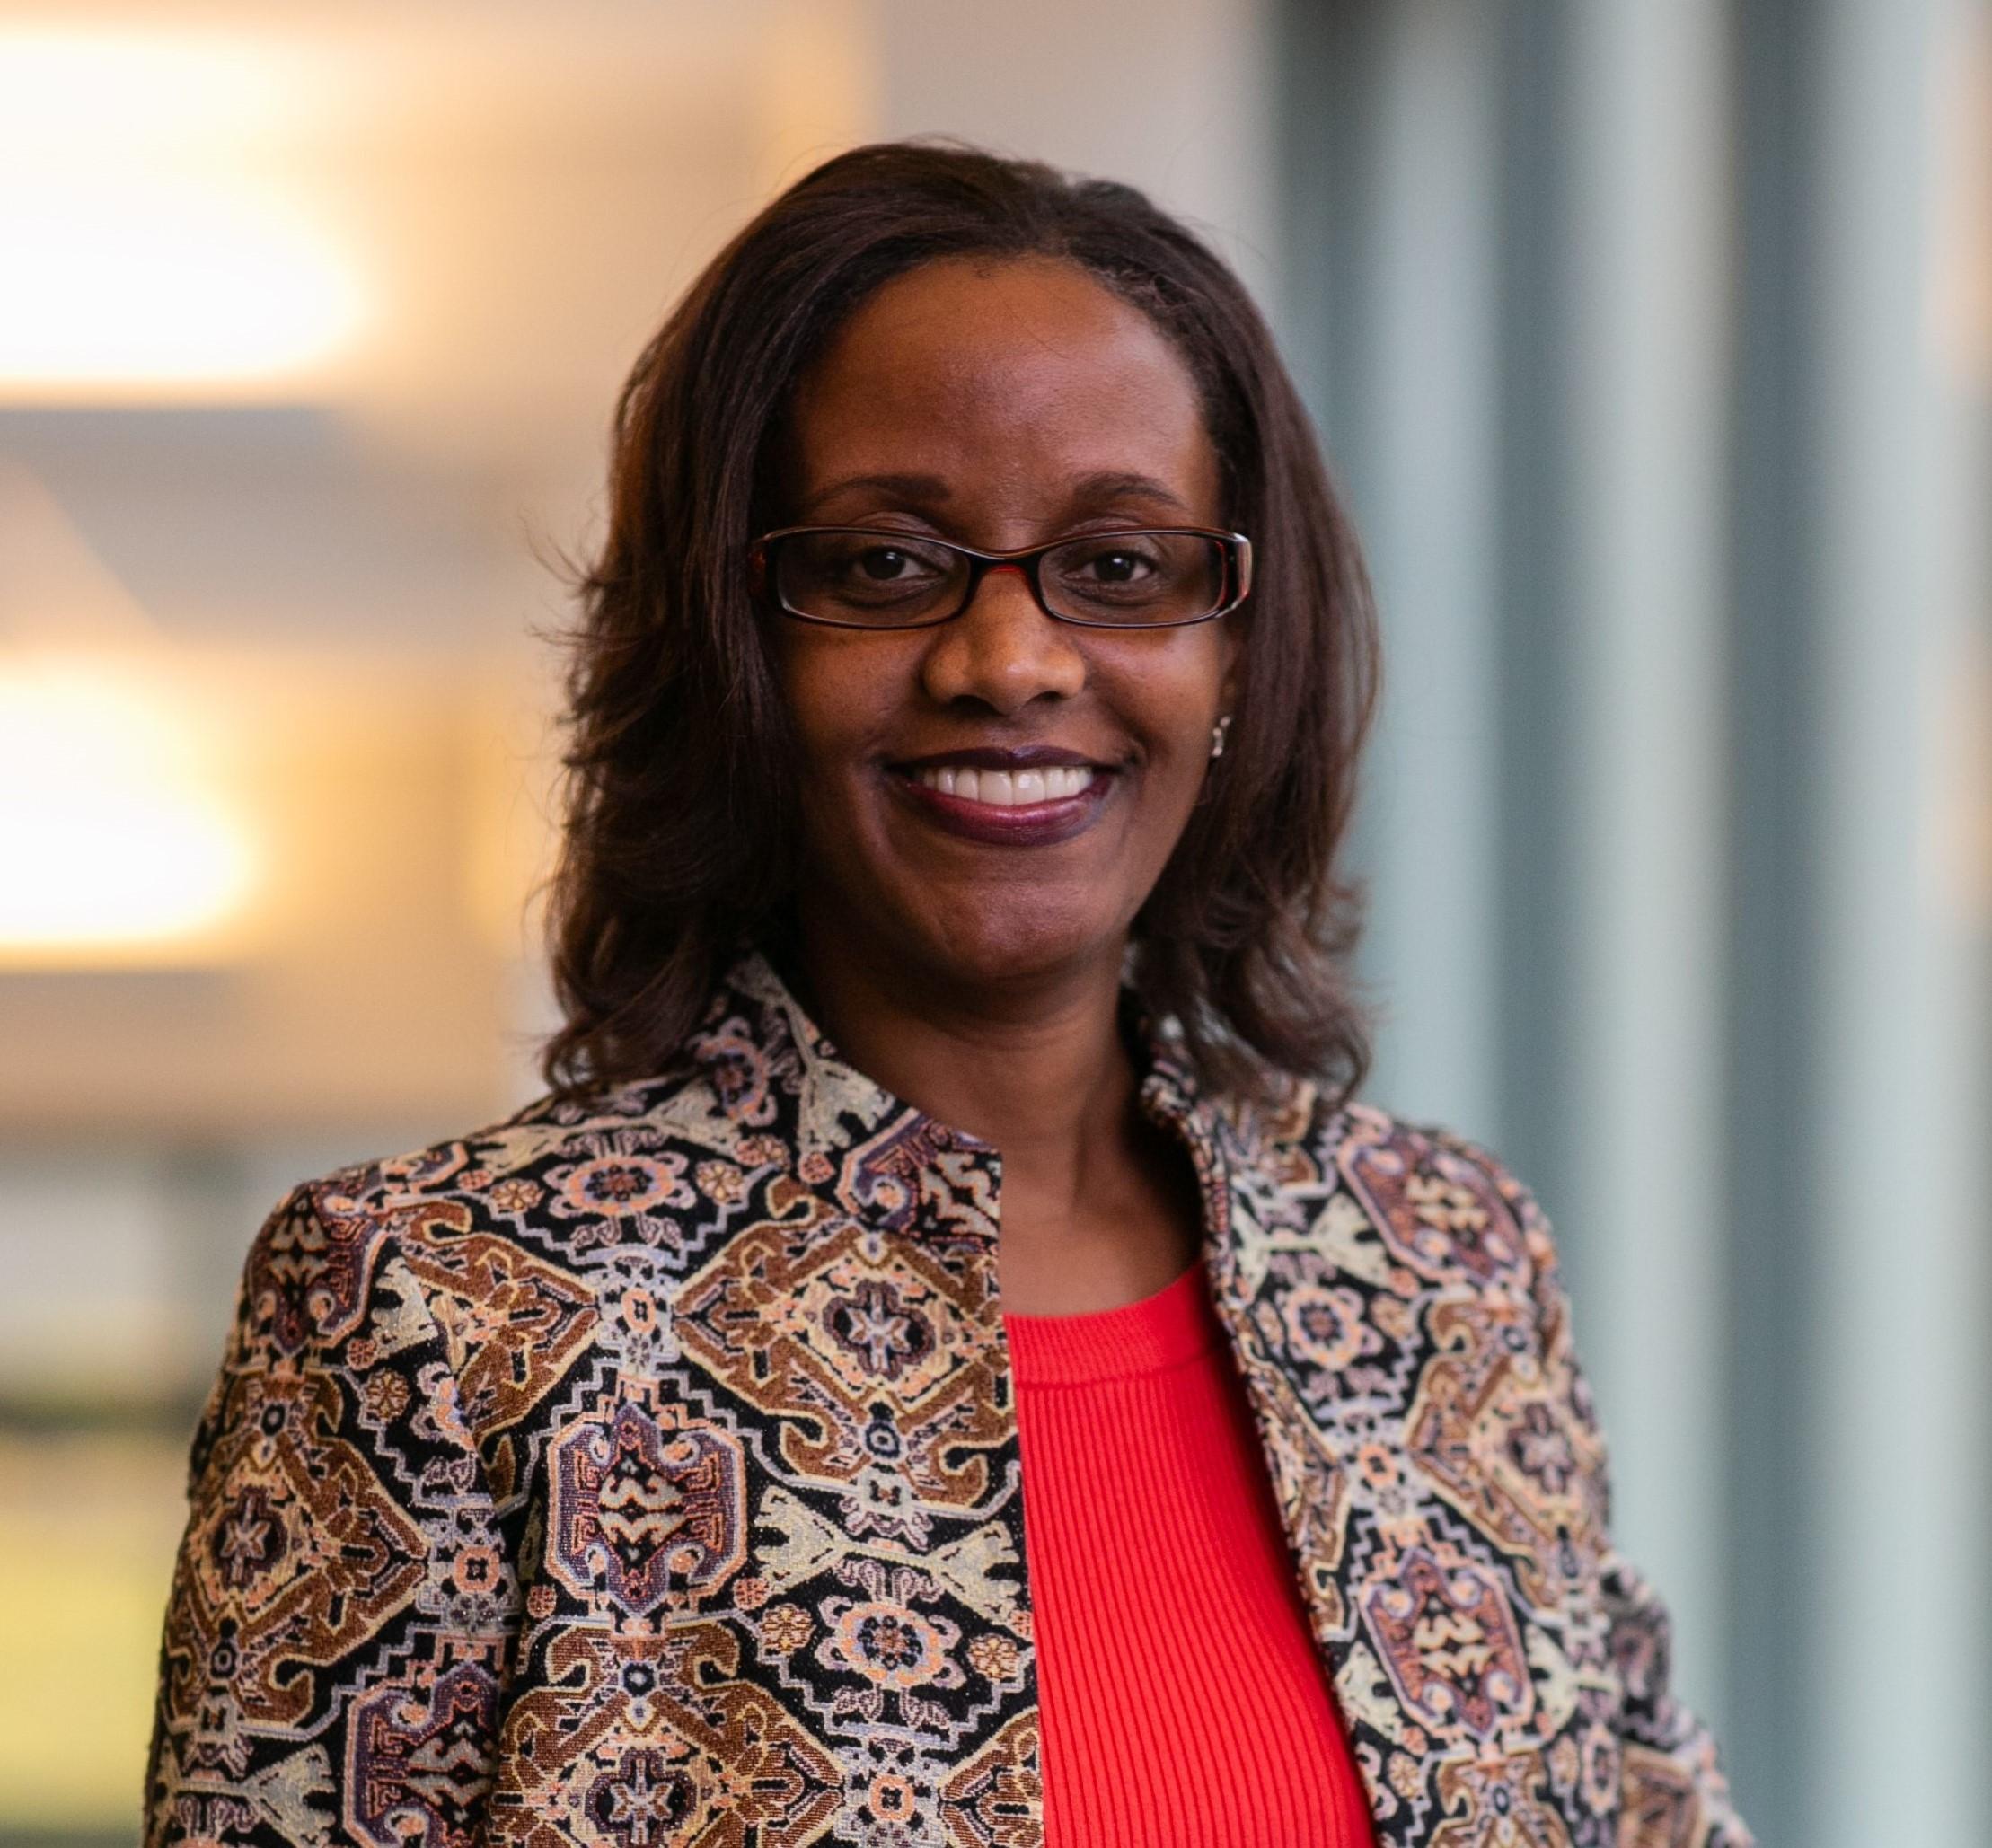 Accounting Professor Kerri-Ann Sanderson